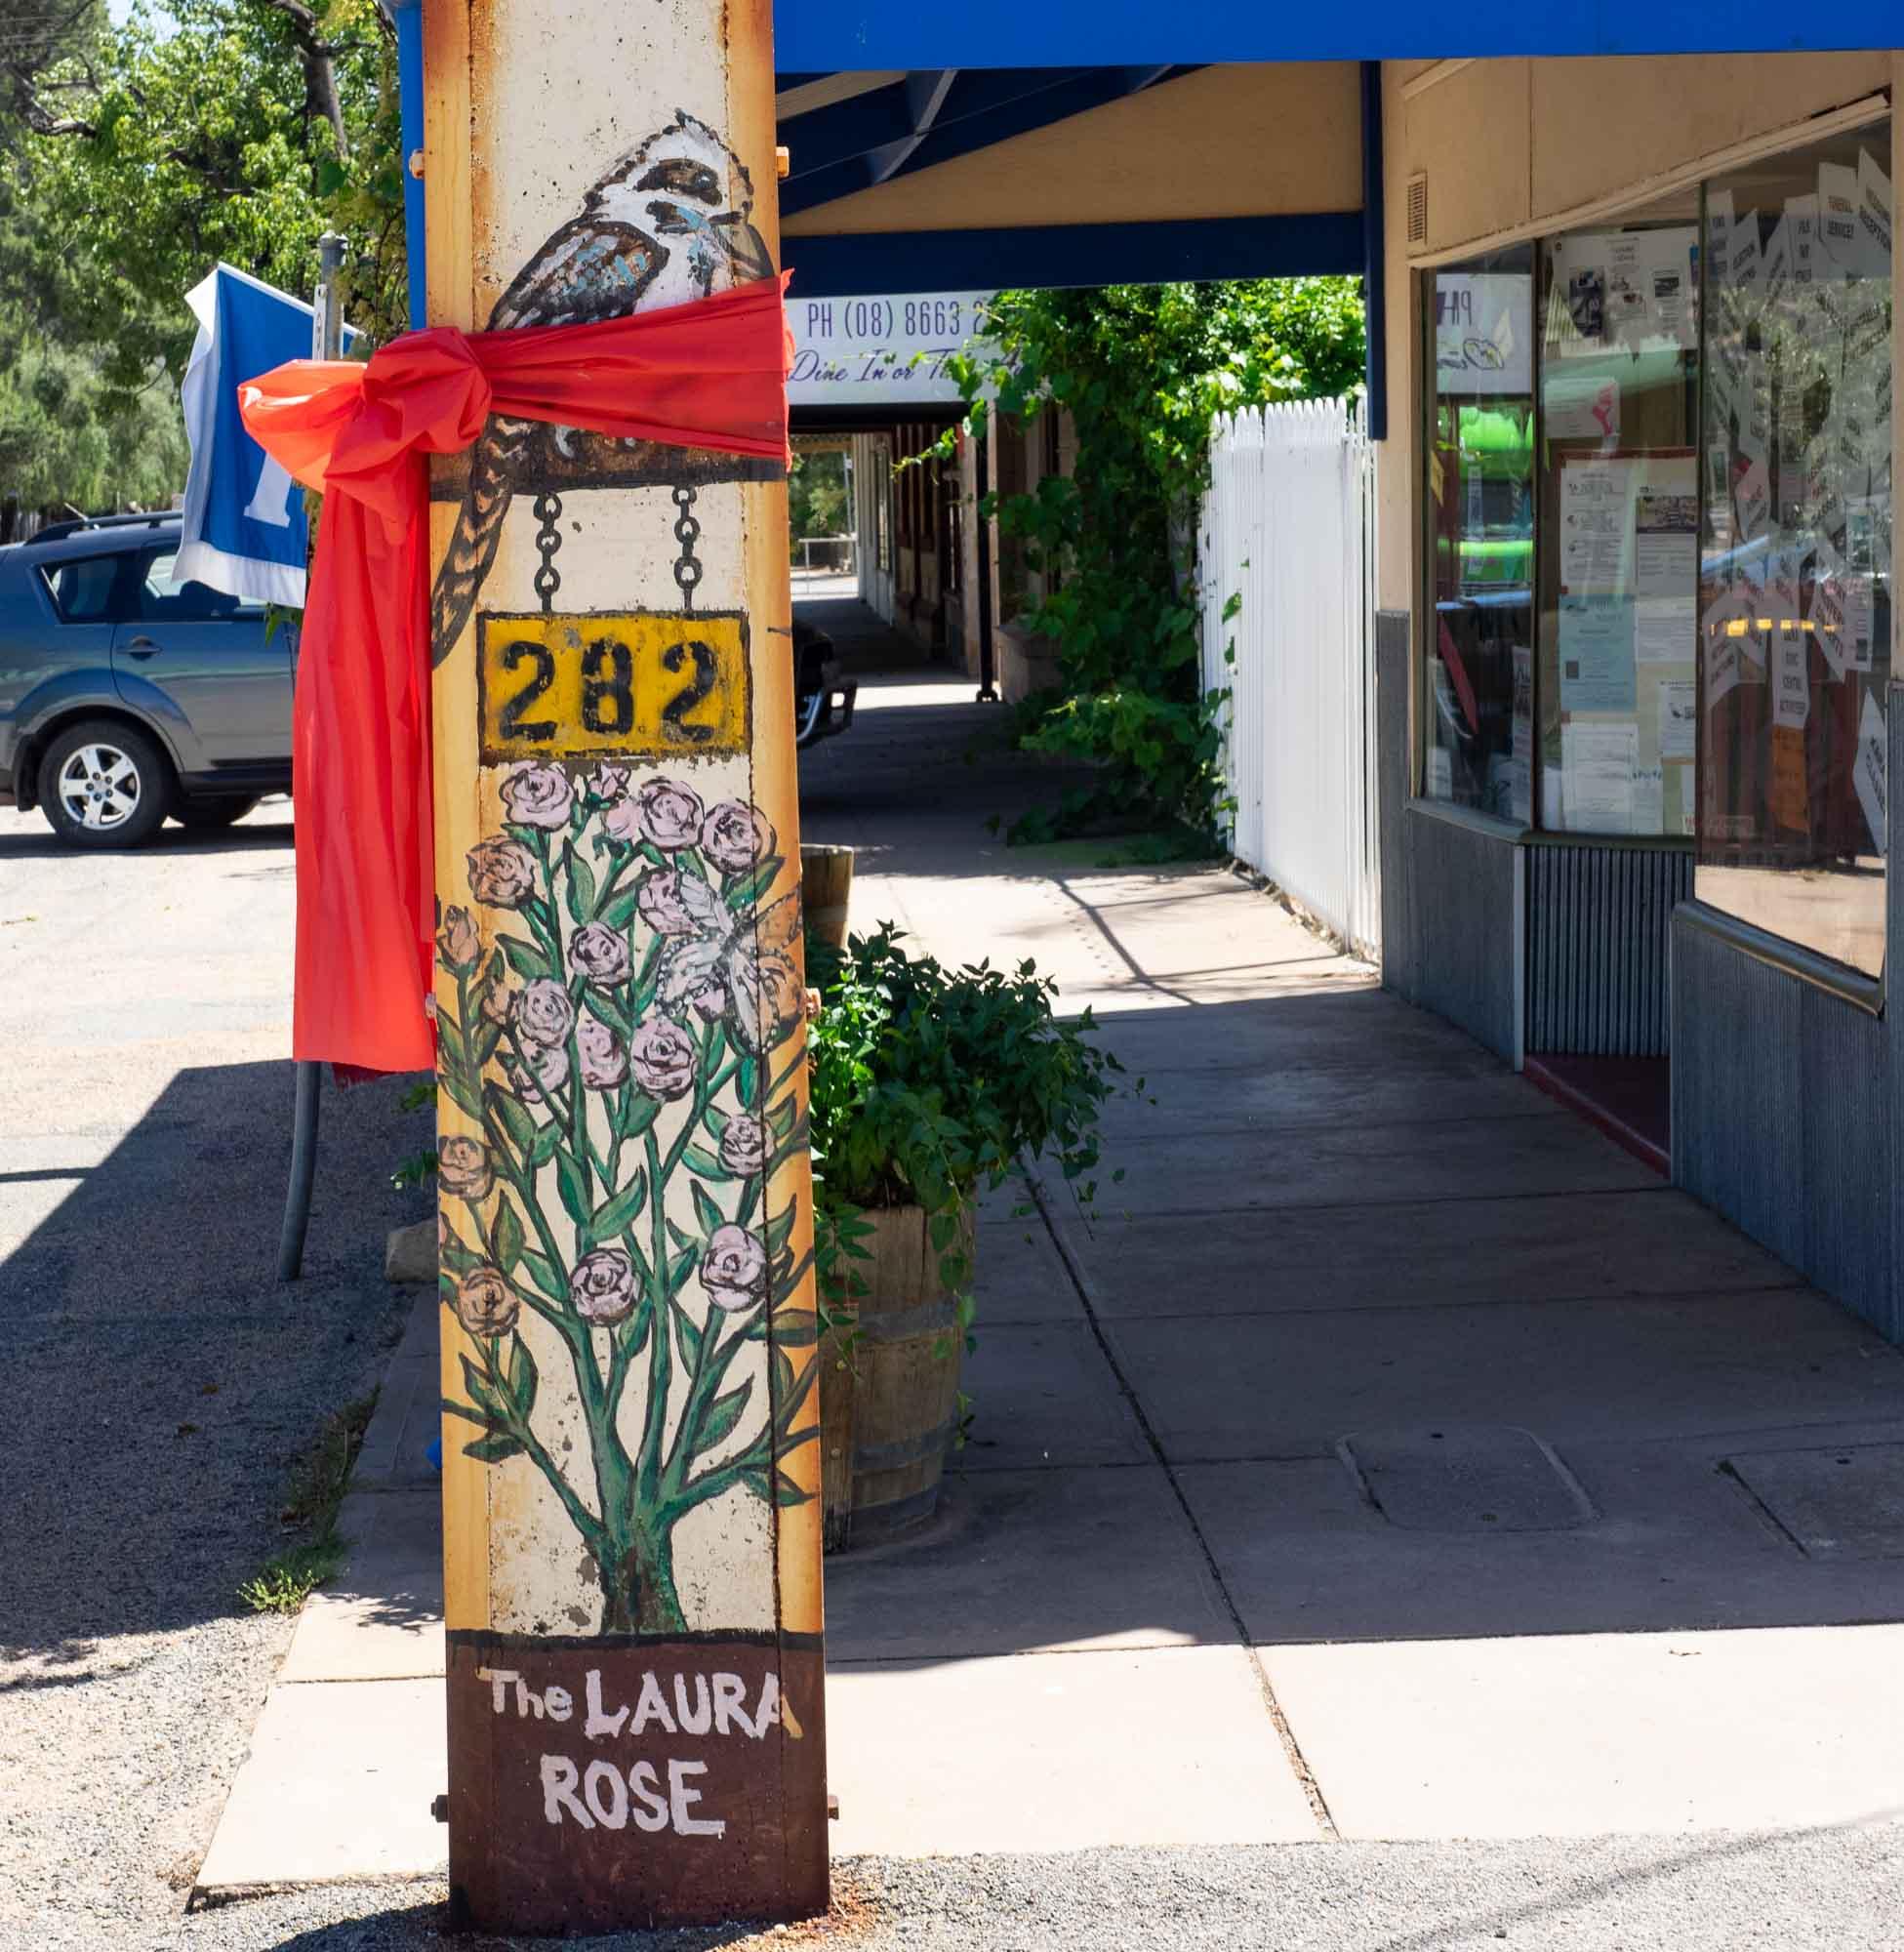 A Stobie Pole becomes artwork